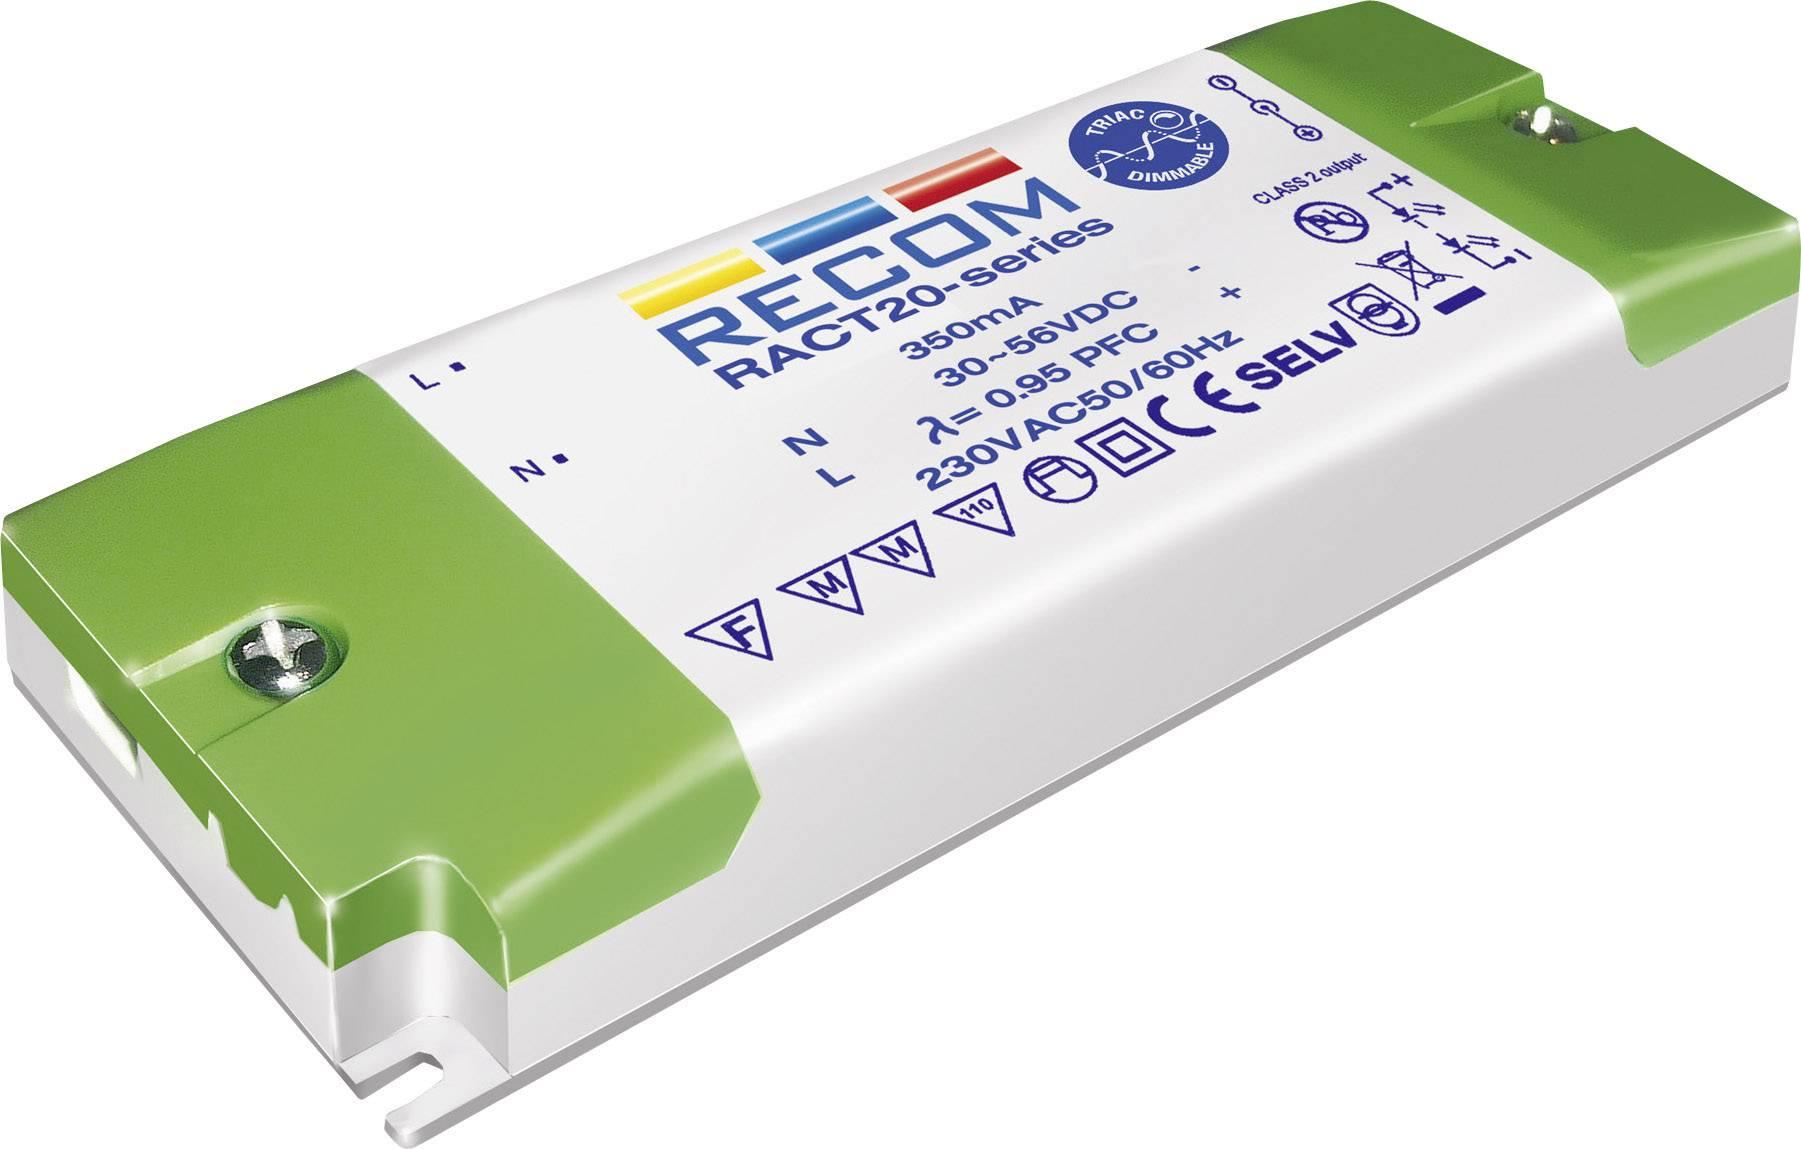 LED driver Recom Lighting RACT20-350, 20 W (max), 0.35 A, 30 - 56 V/DC